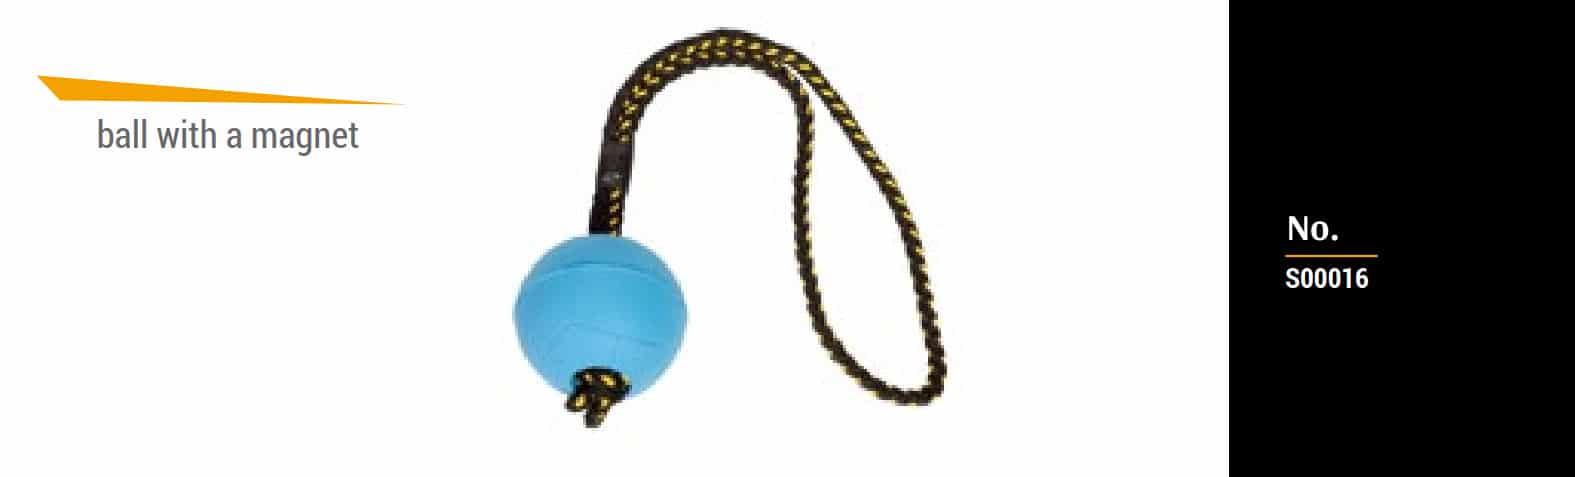 Gumijasta žoga z magnetom 4